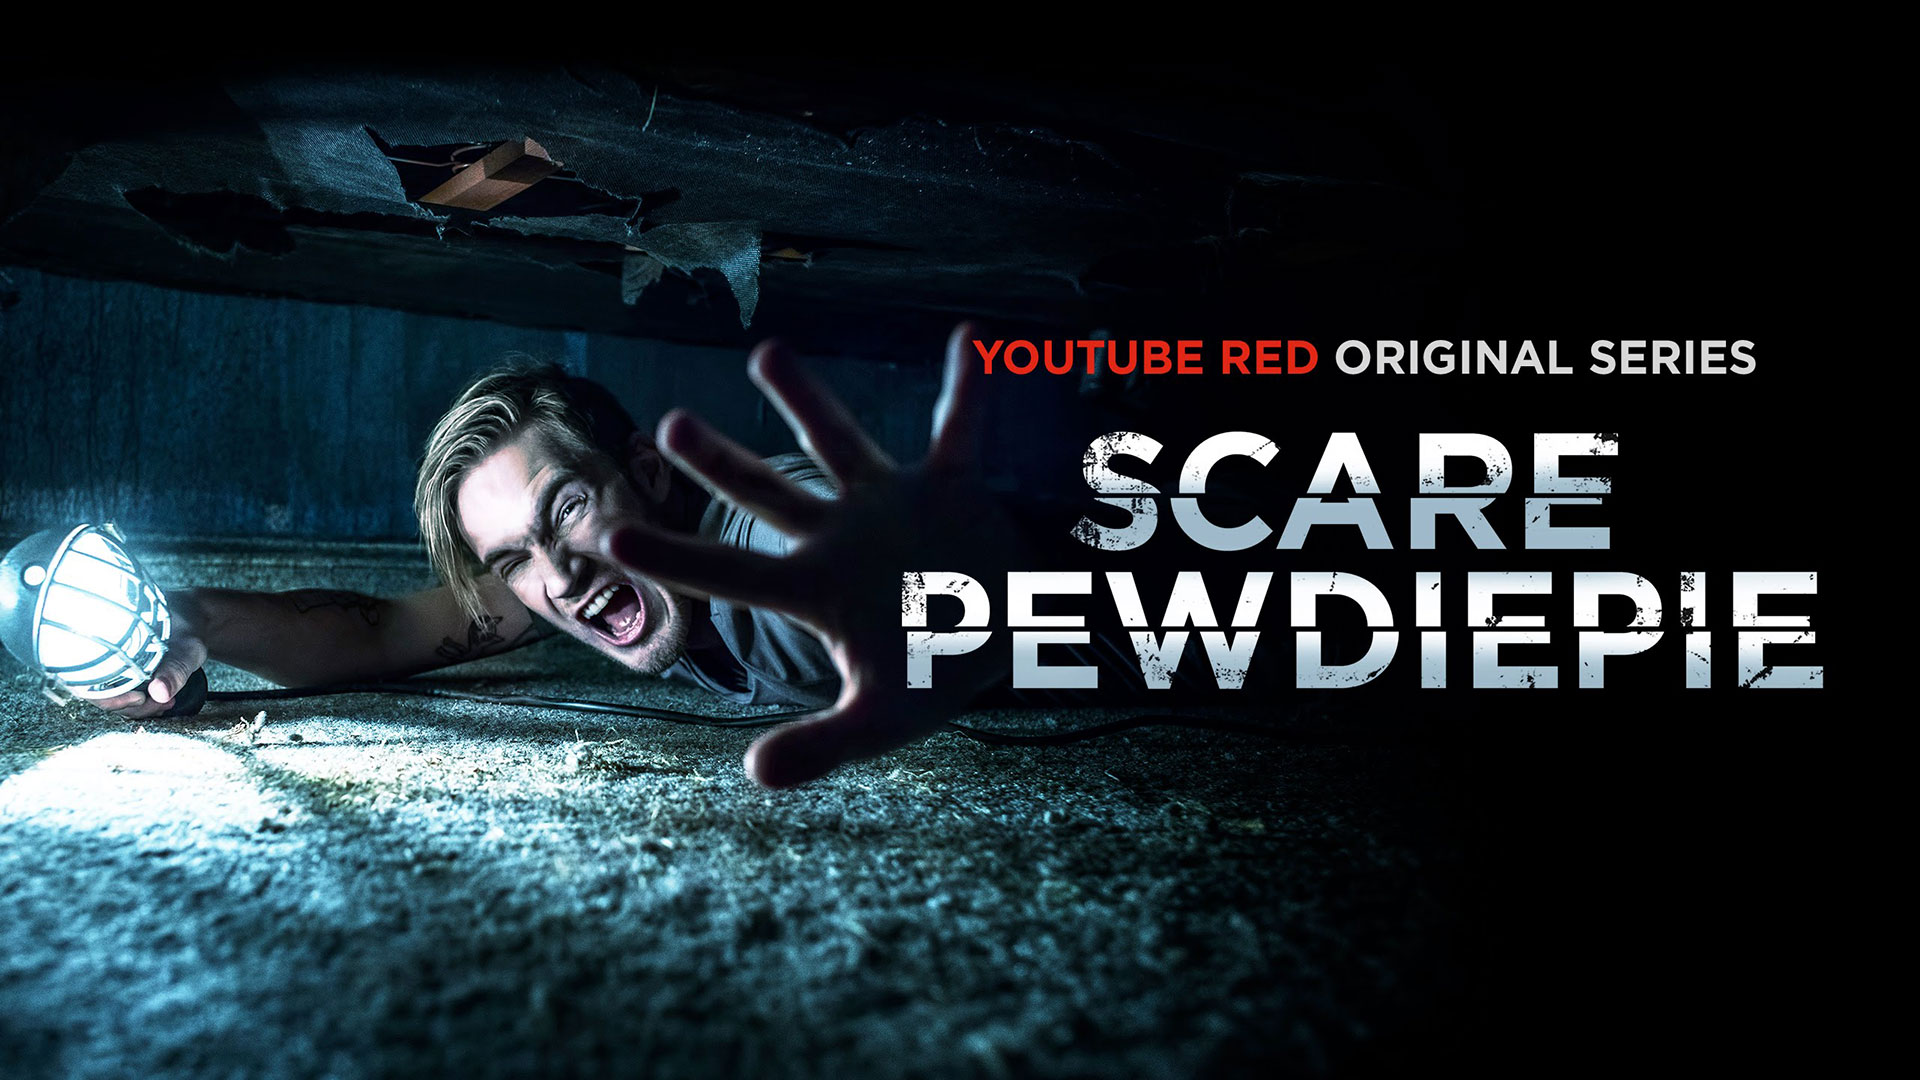 scare pewdiepie episodes